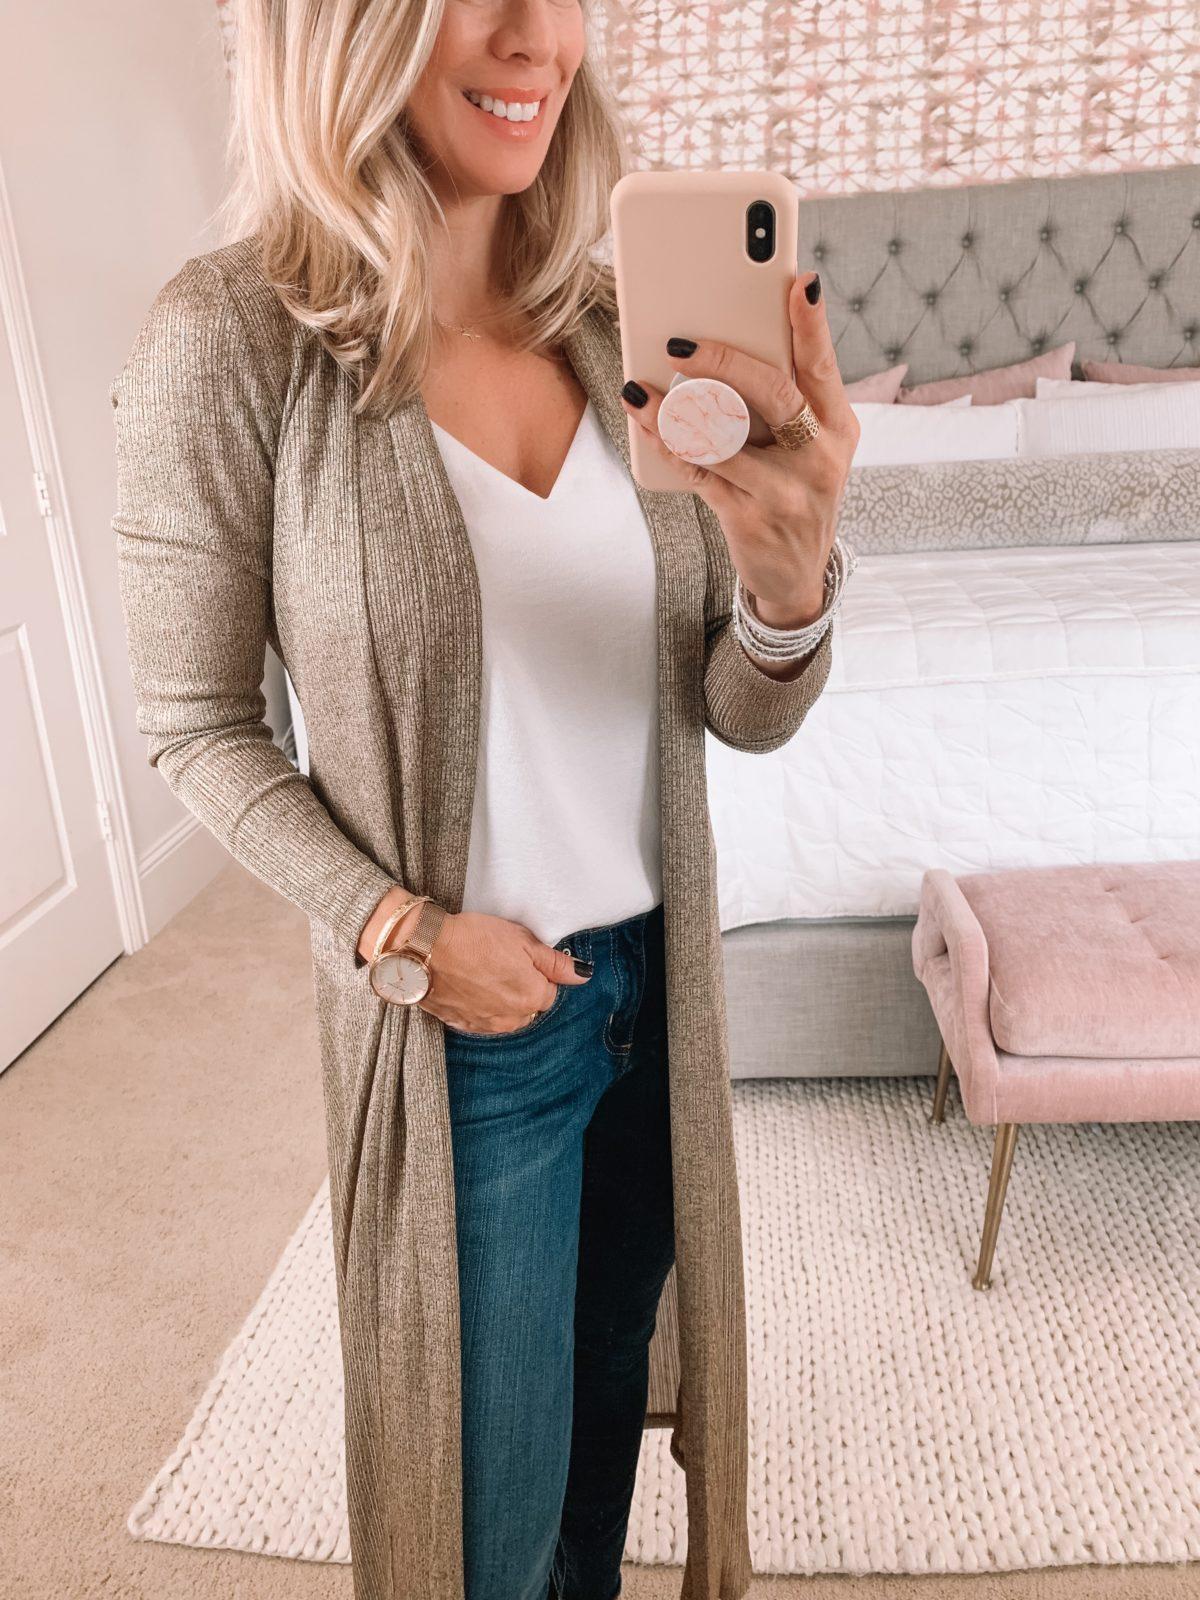 Dressing Room, Gold Duster, Skinny Jeans, Heels